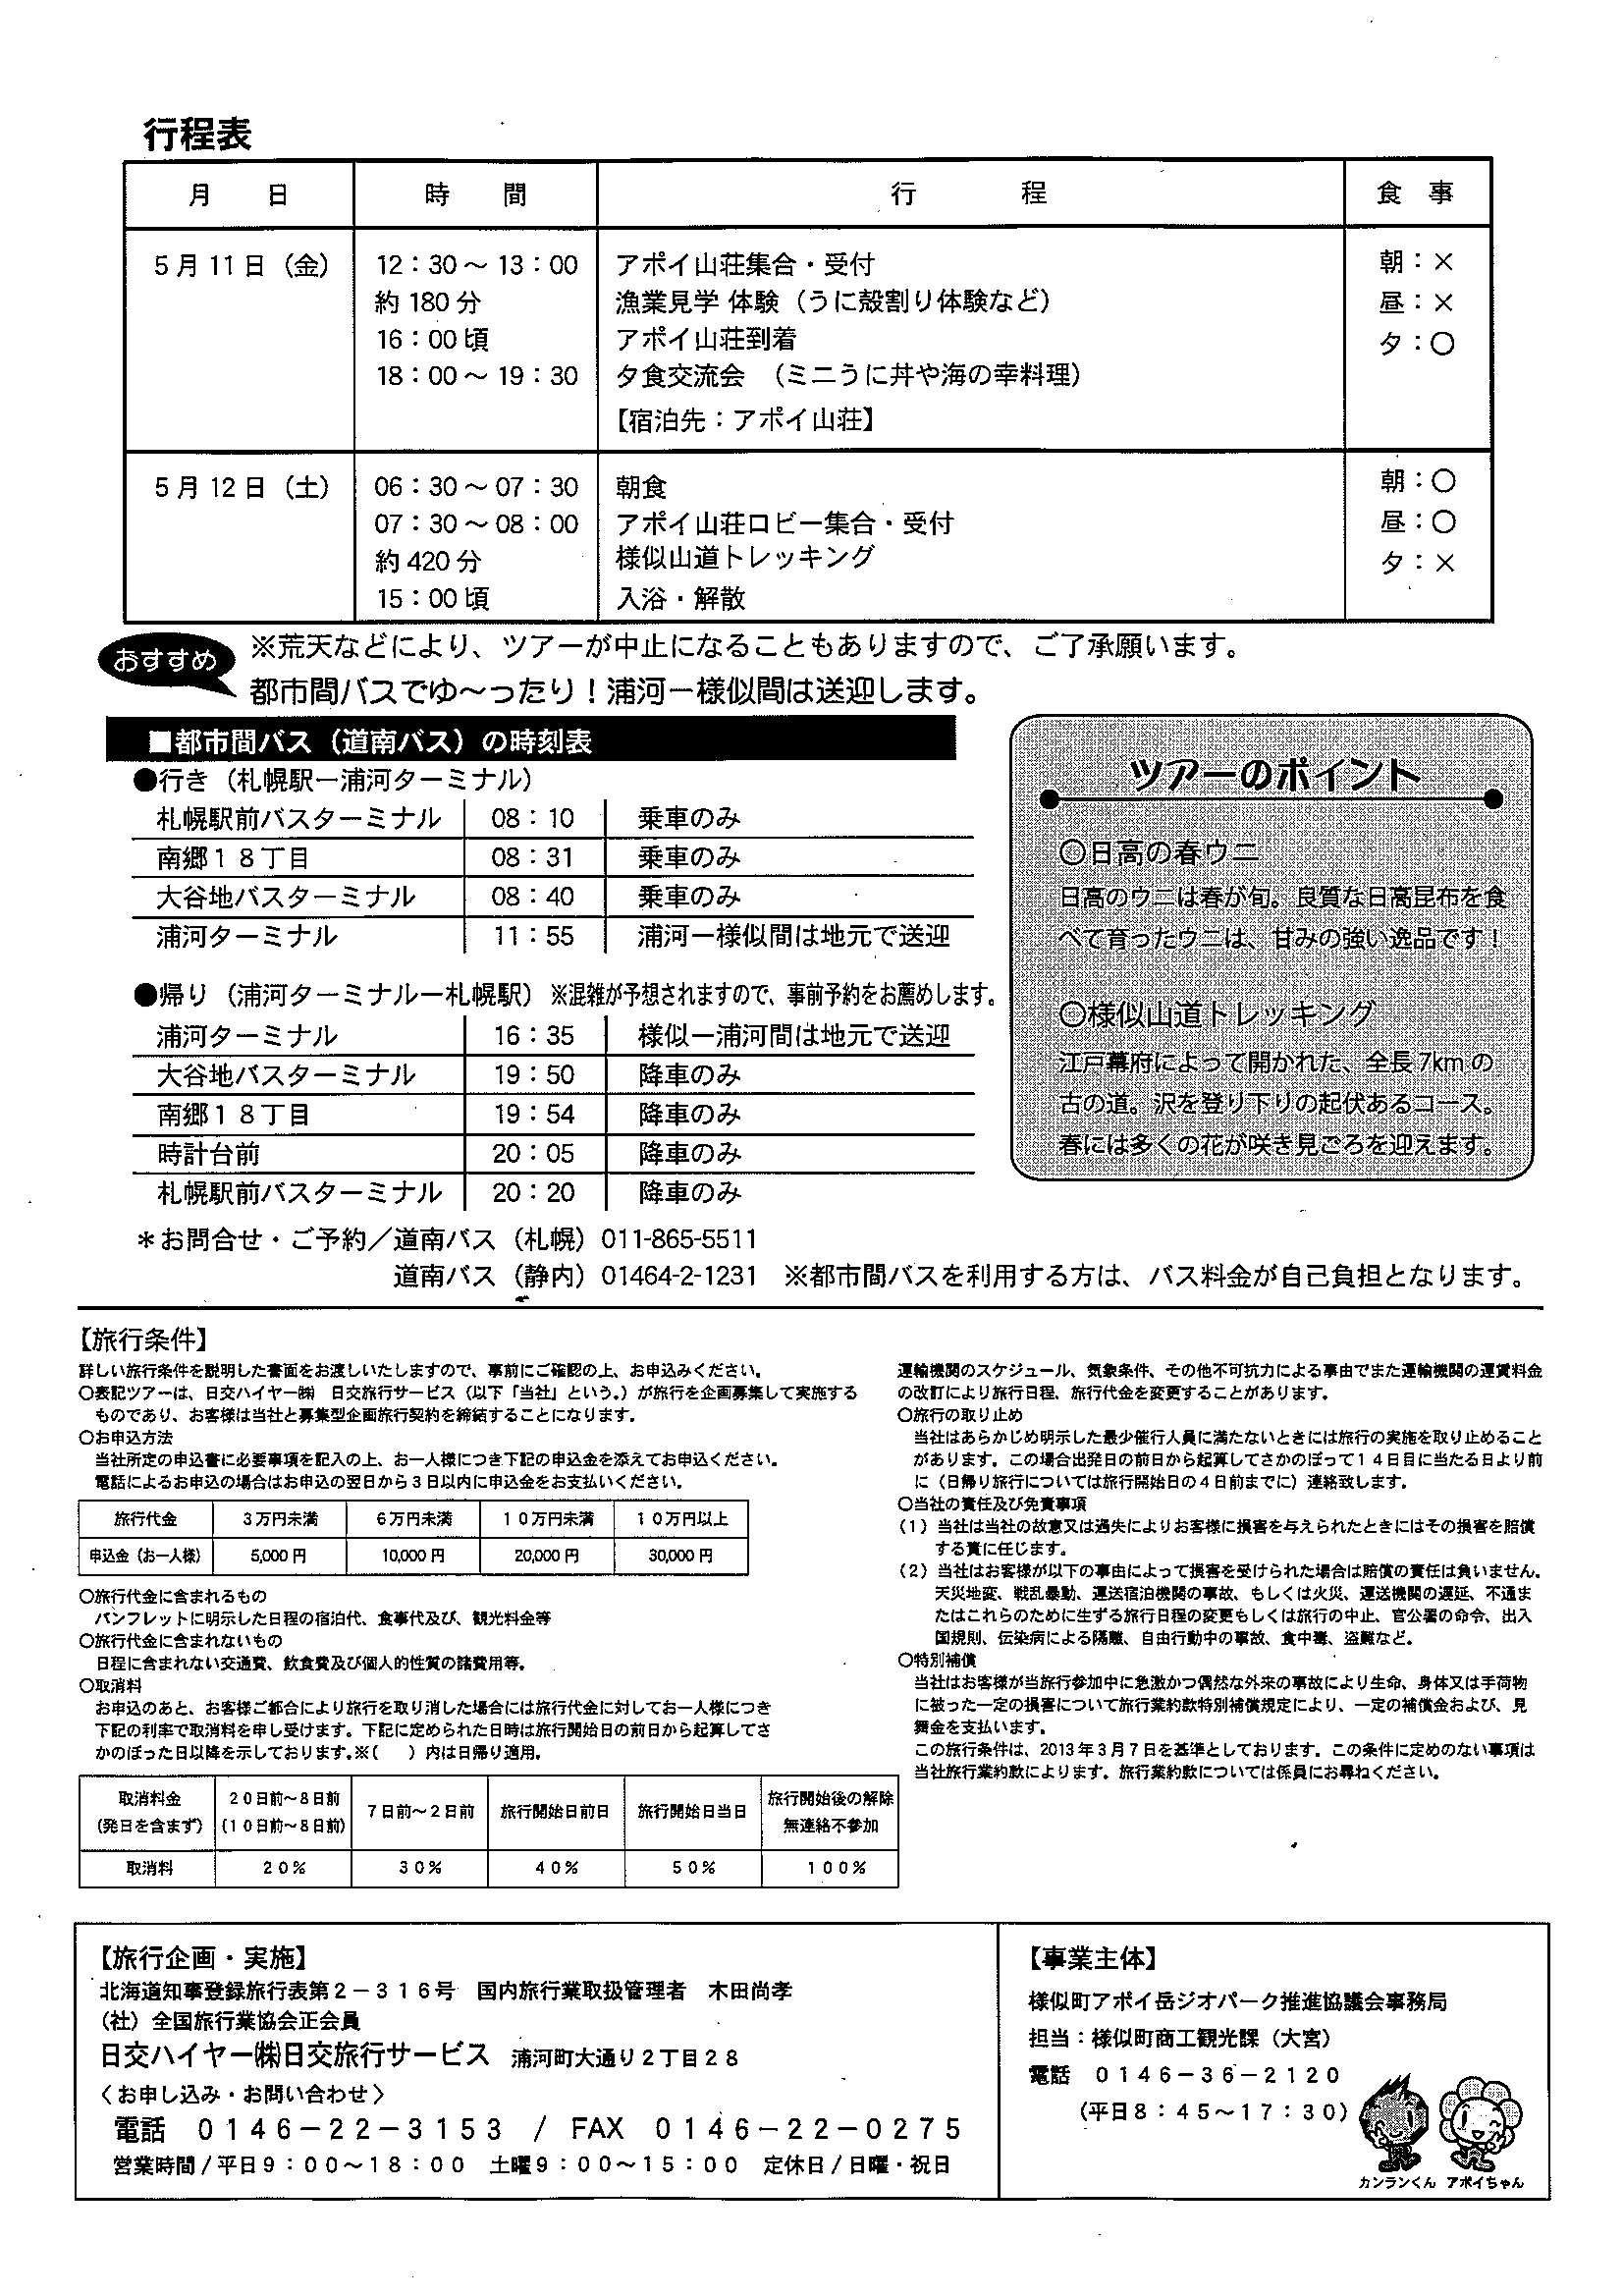 http://www.apoi-geopark.jp/event/%E6%A7%98%E4%BC%BC%E5%B1%B1%E9%81%93%E3%83%84%E3%82%A2%E3%83%BC%E8%A3%8F.jpg